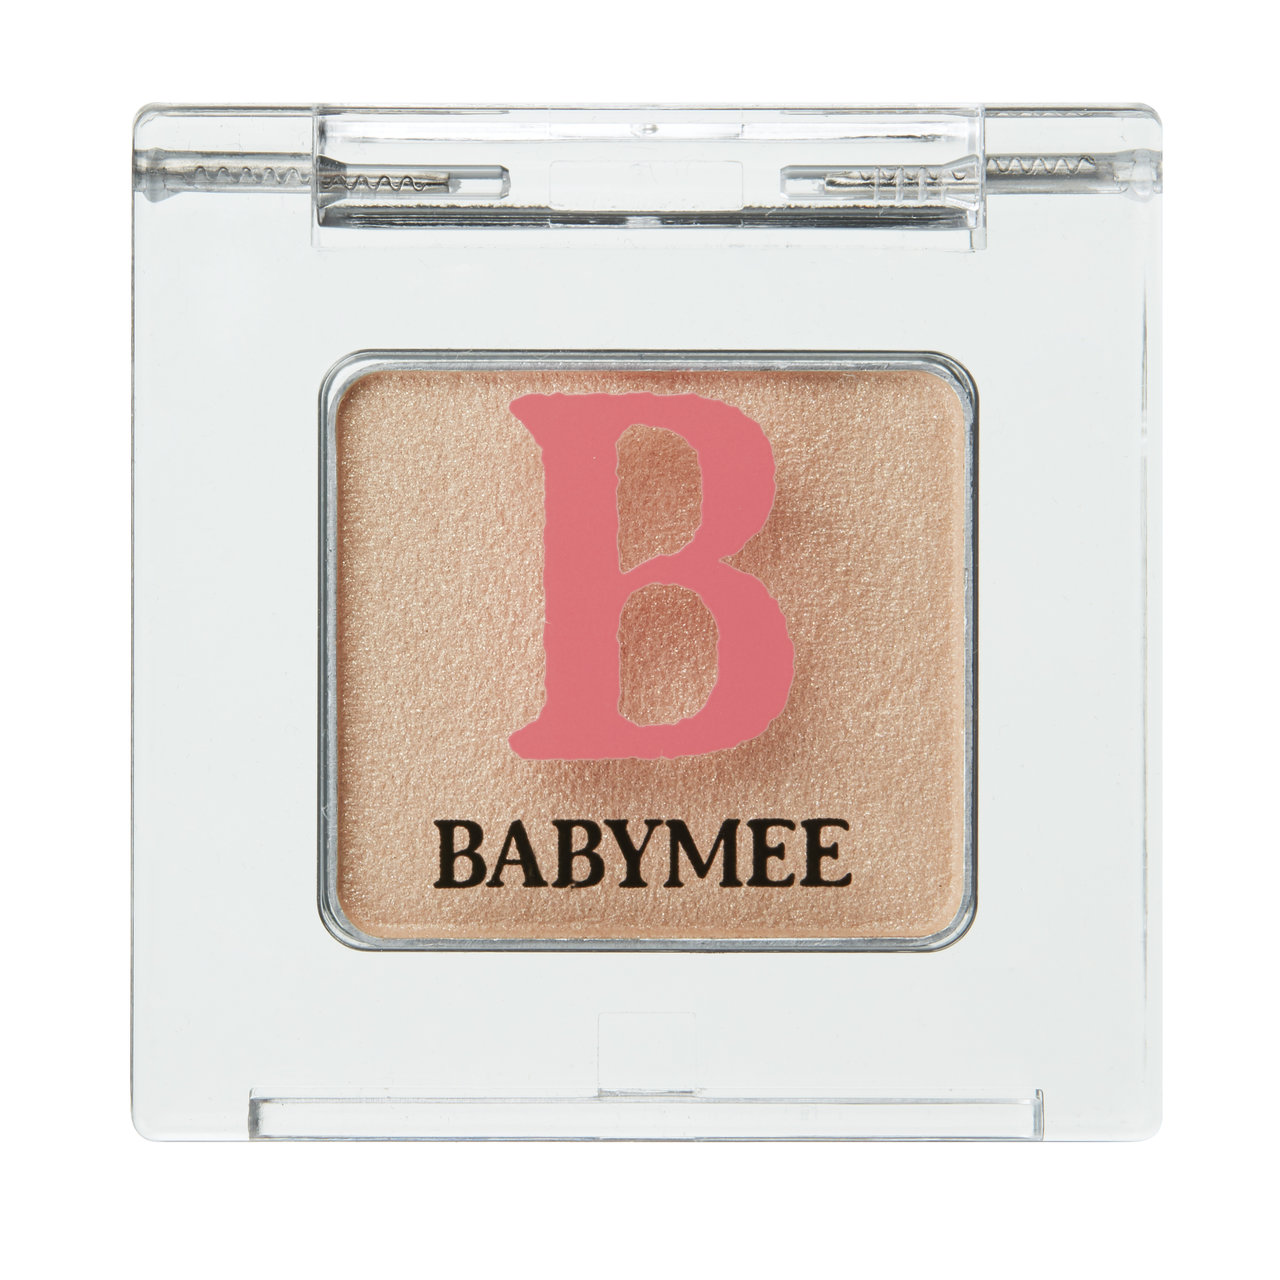 BABYMEE(ベイビーミー) ニュアンスカラーシャドウ「ネイルピンク」